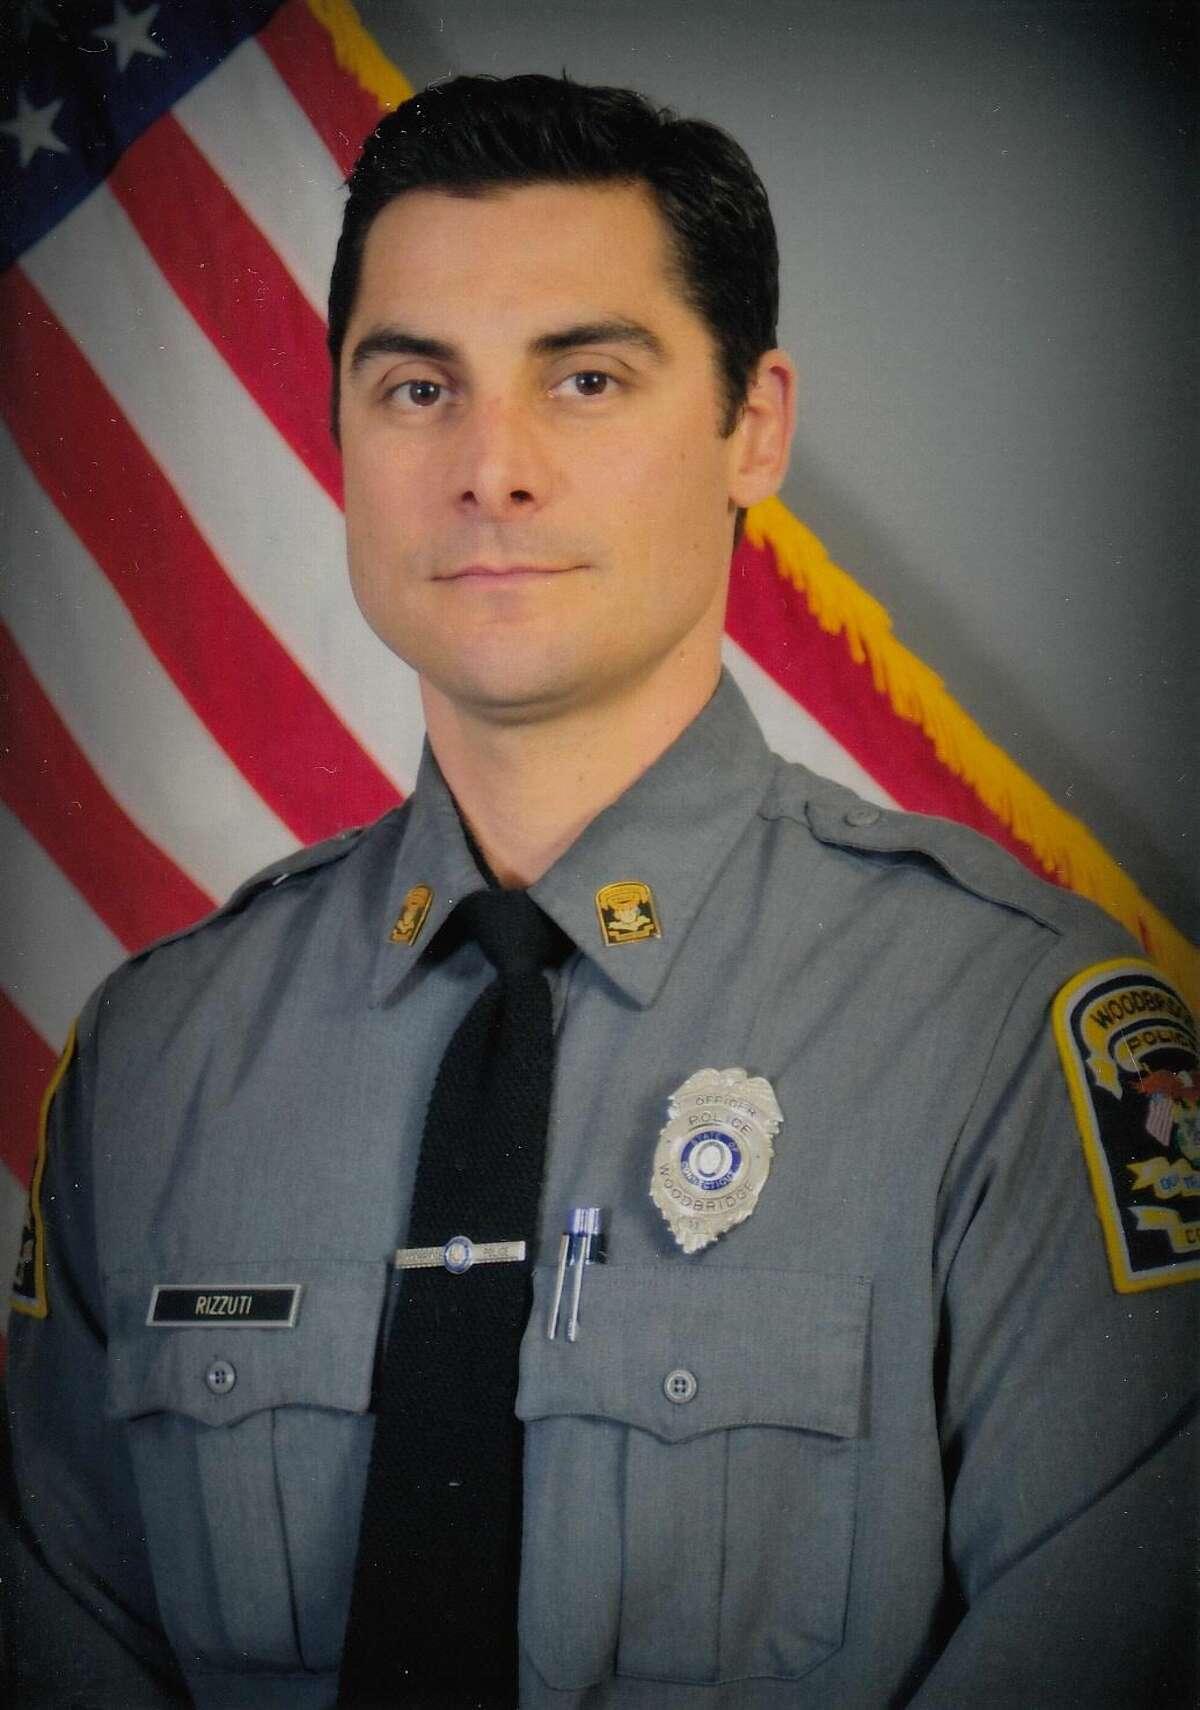 CONTRIBUTED PHOTO Sgt. Richard Rizzuti